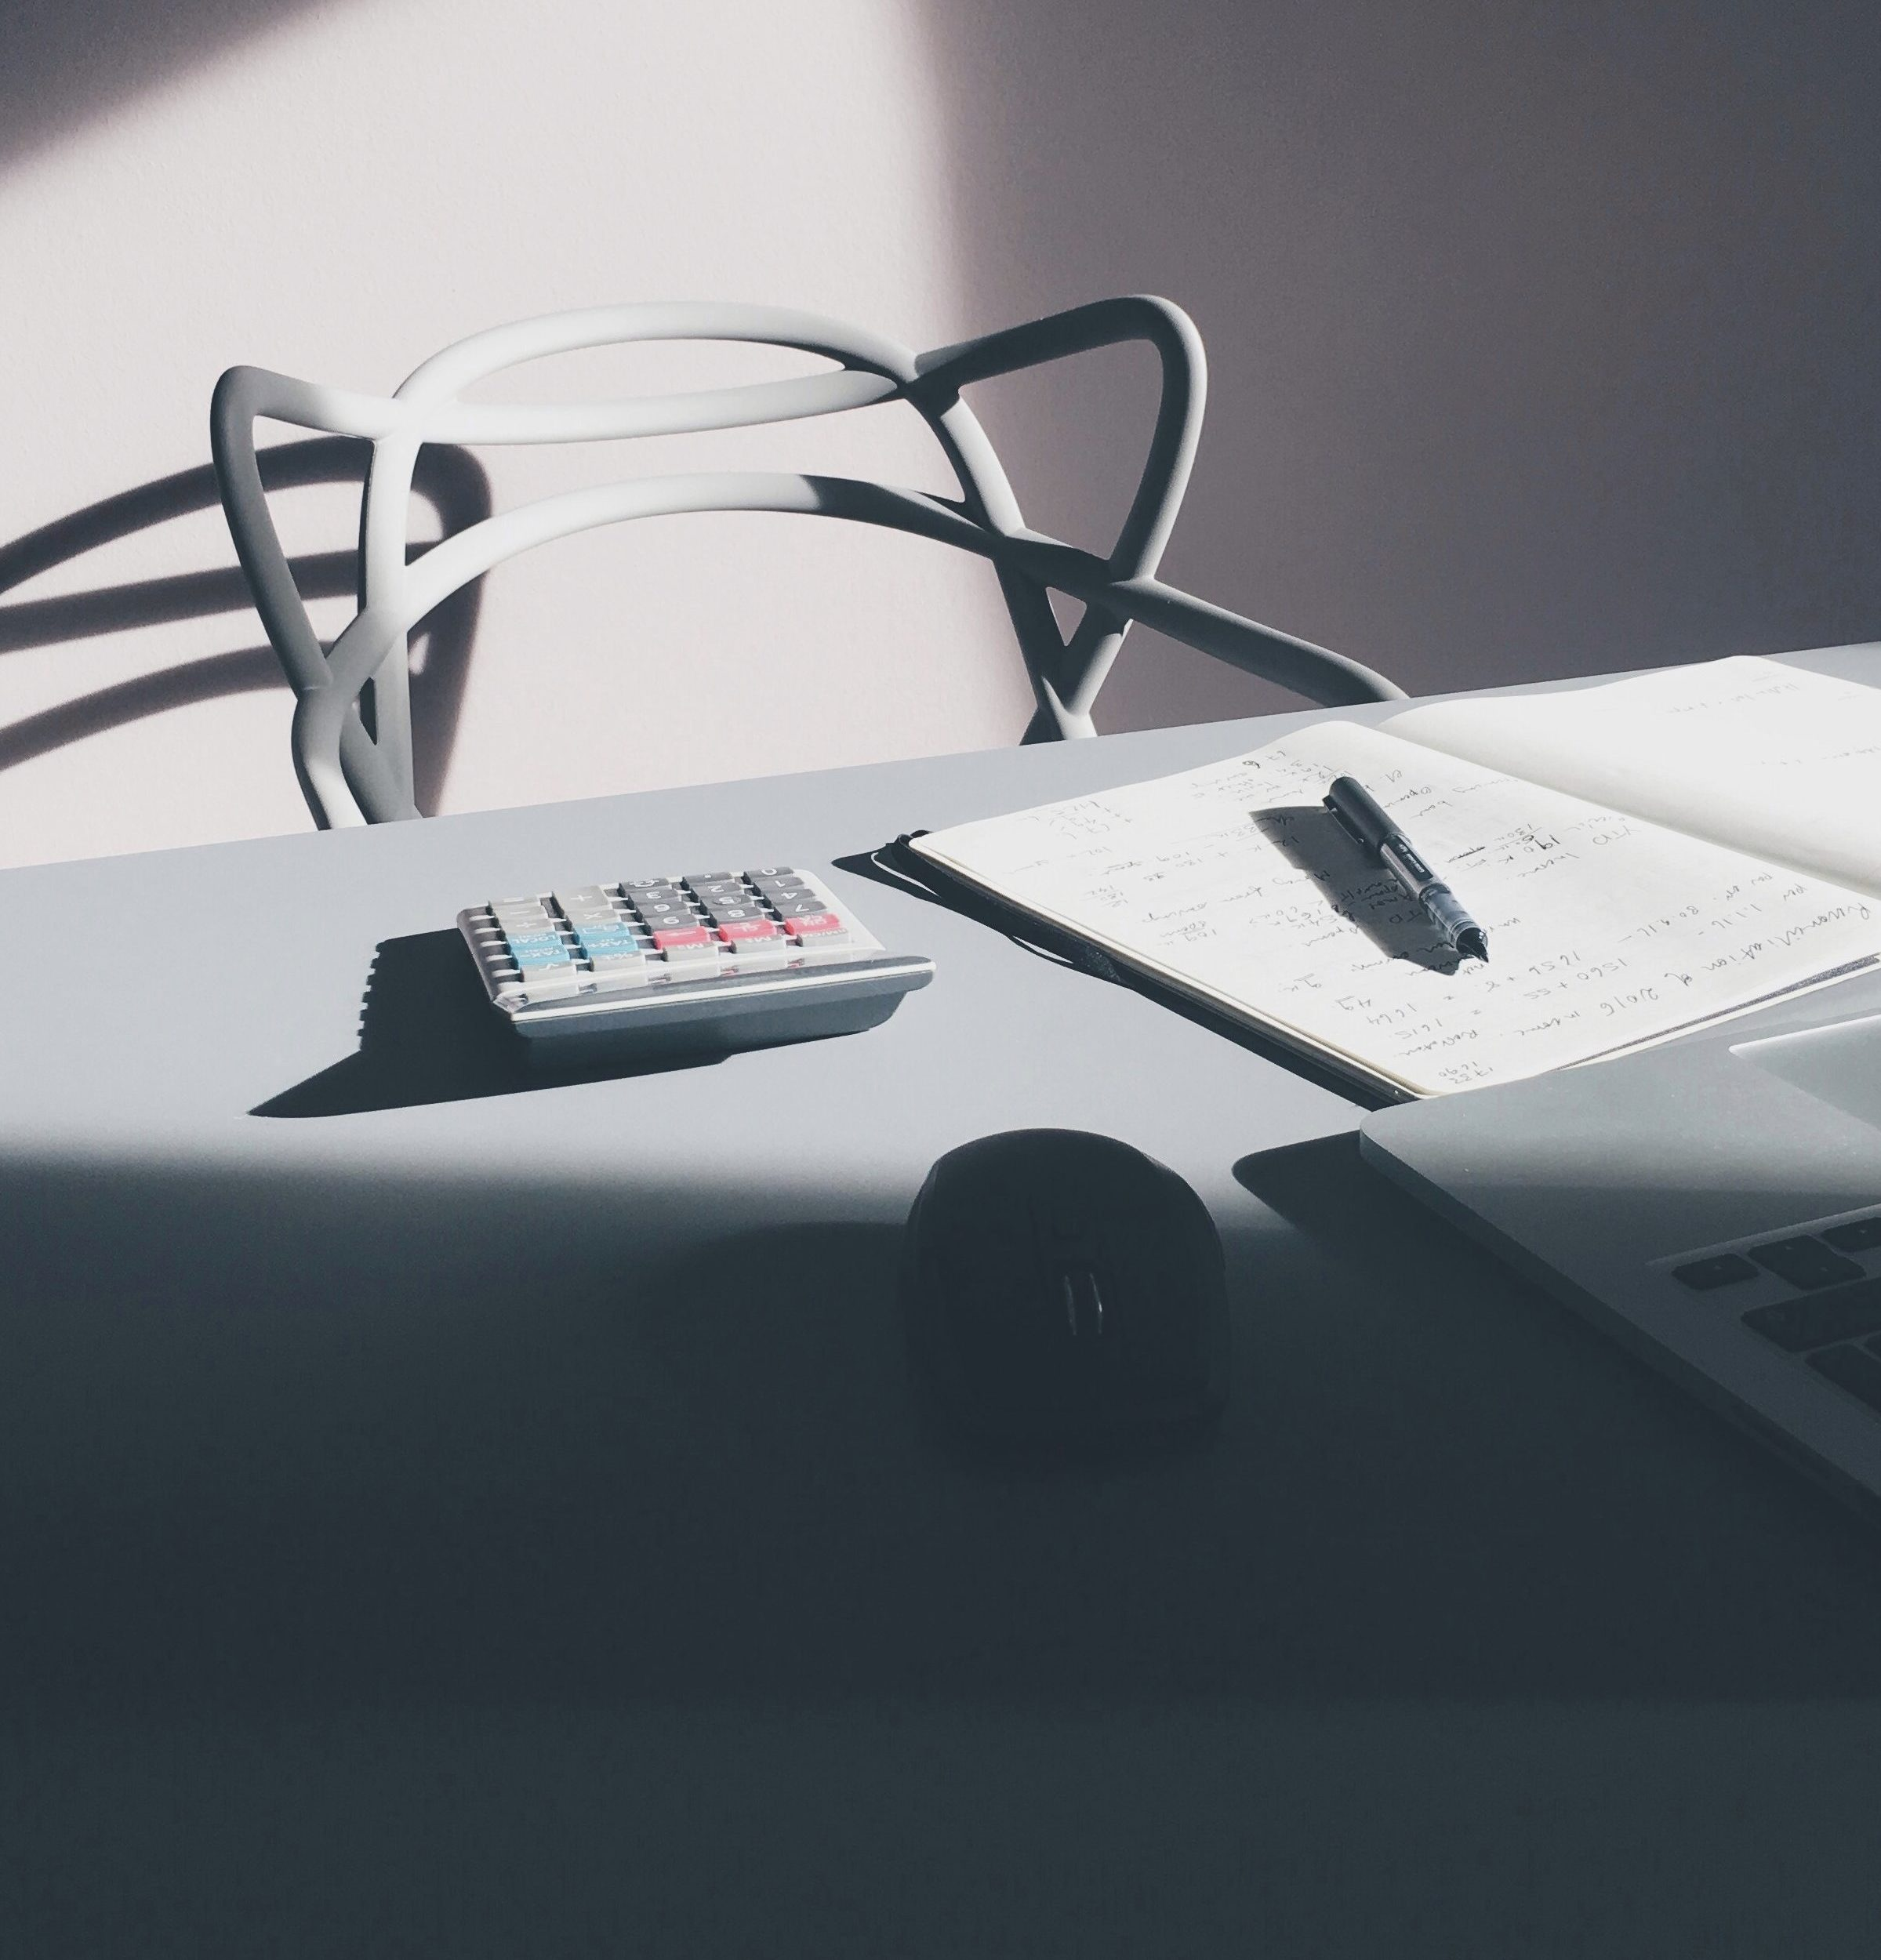 revenue per employee calculation